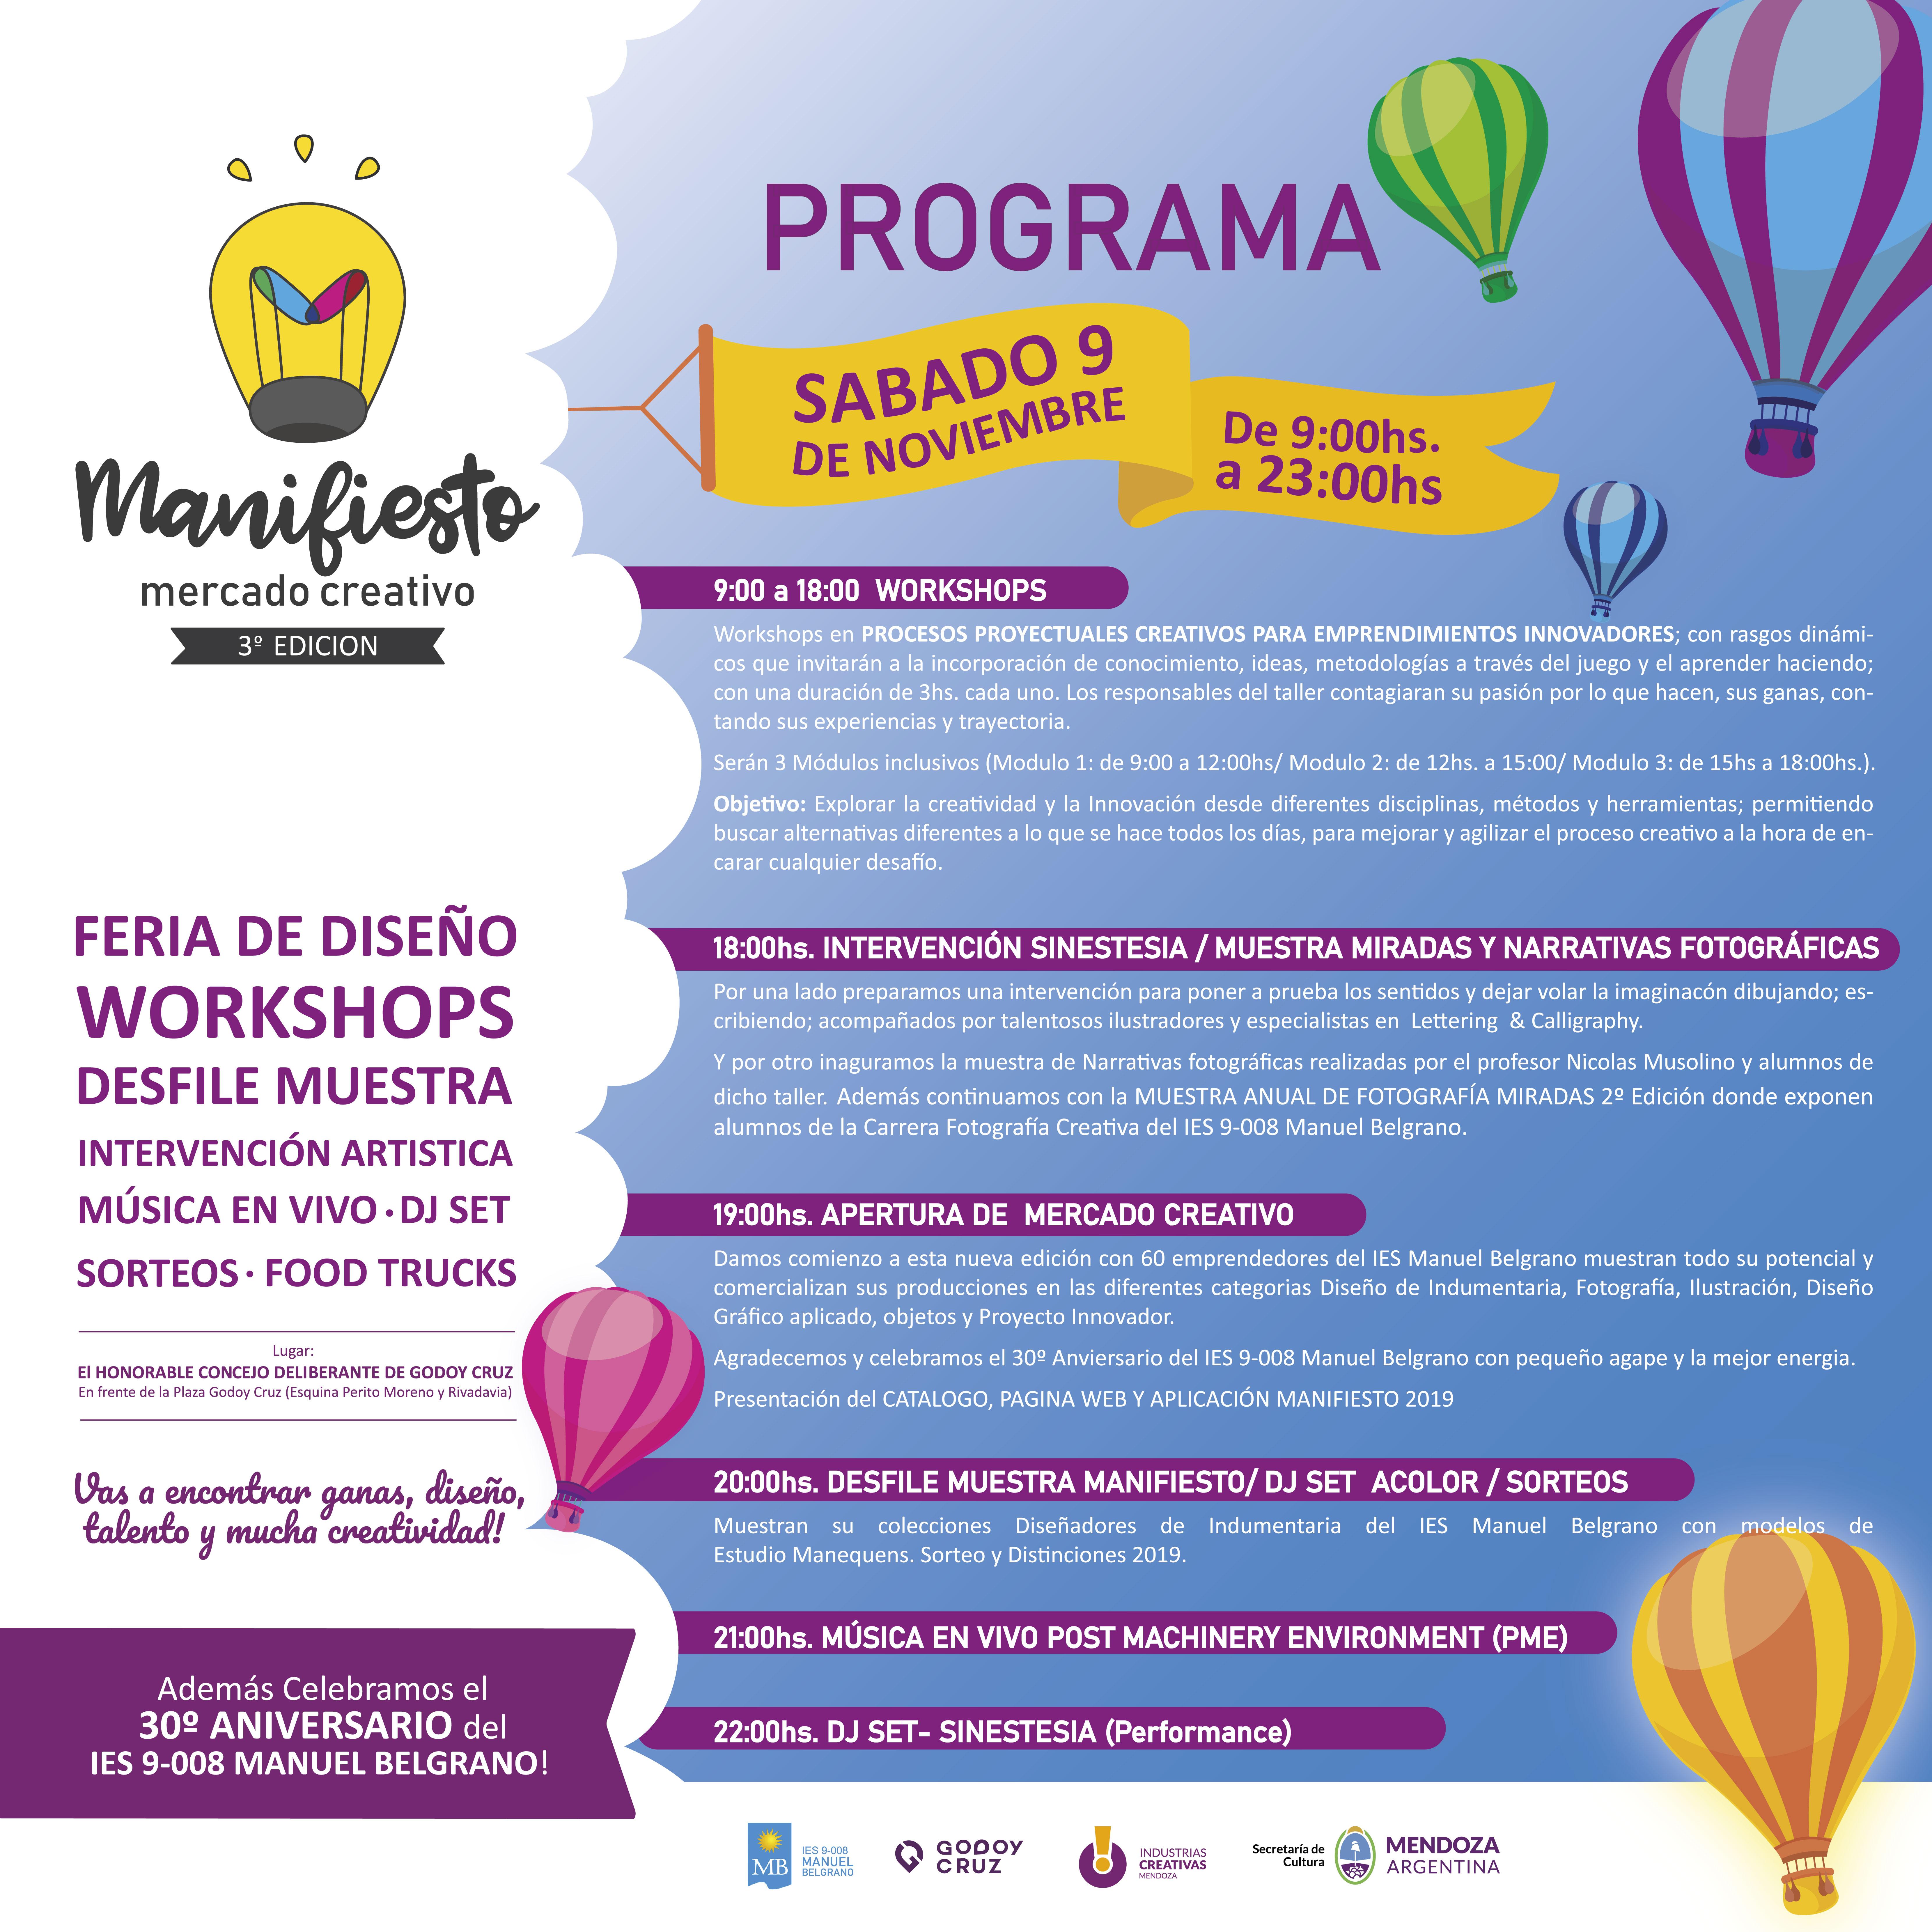 Programa Mmanifiesto 2019_progarma manifiesto 2019 1080x1080